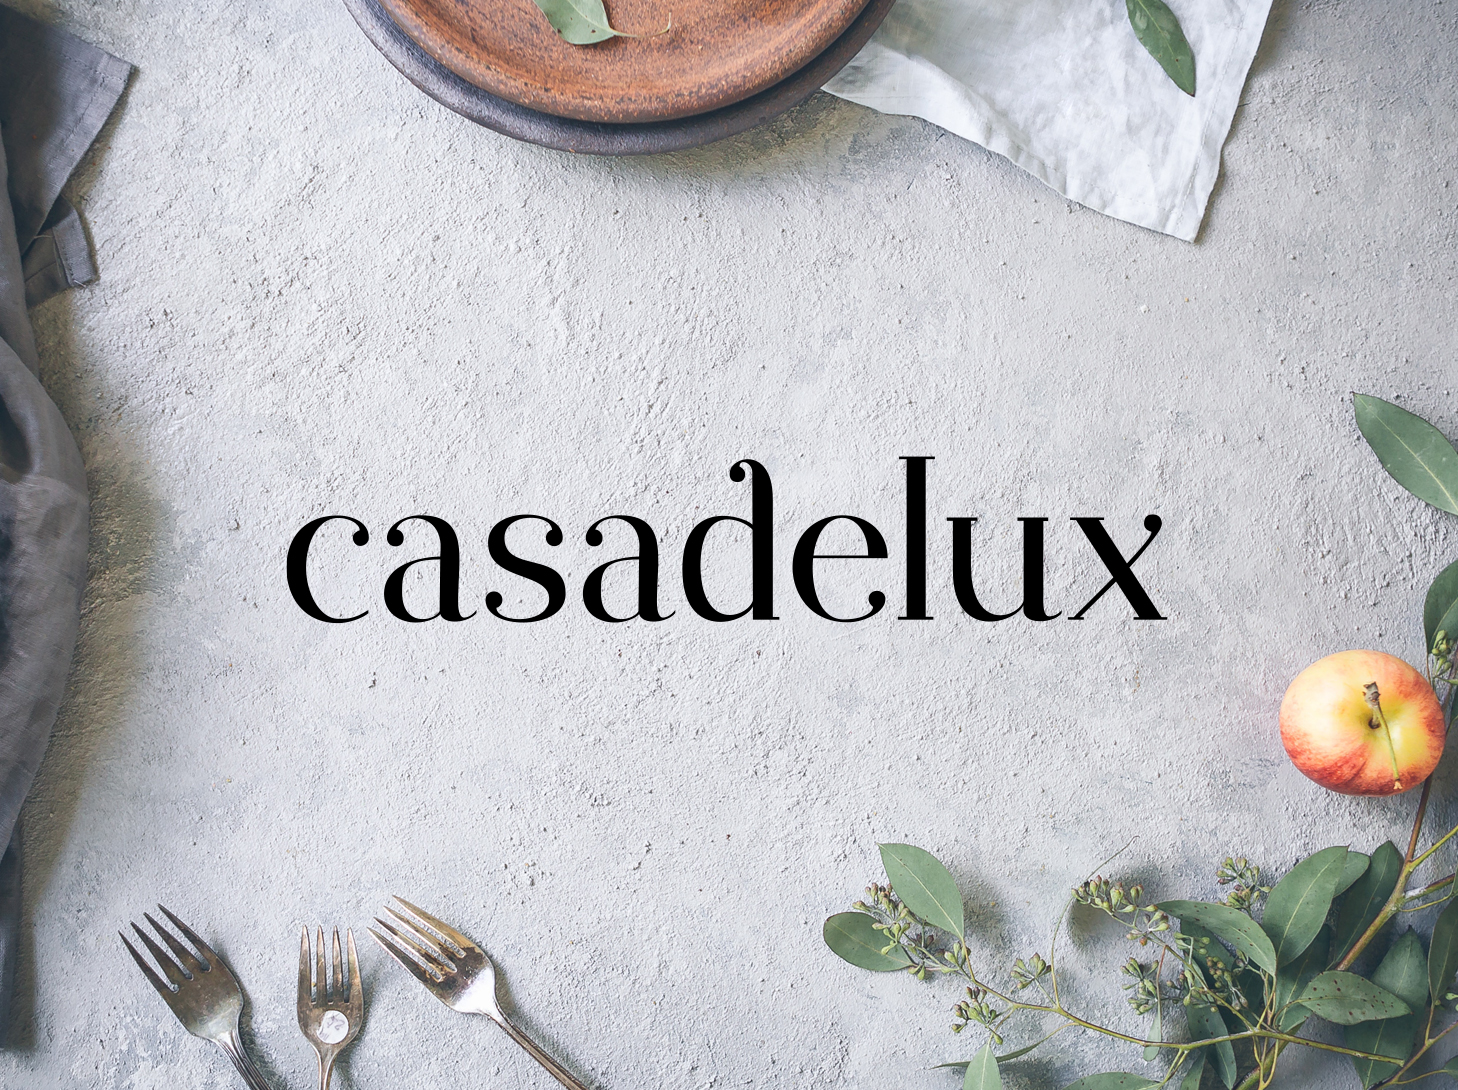 Casadelux - #identity